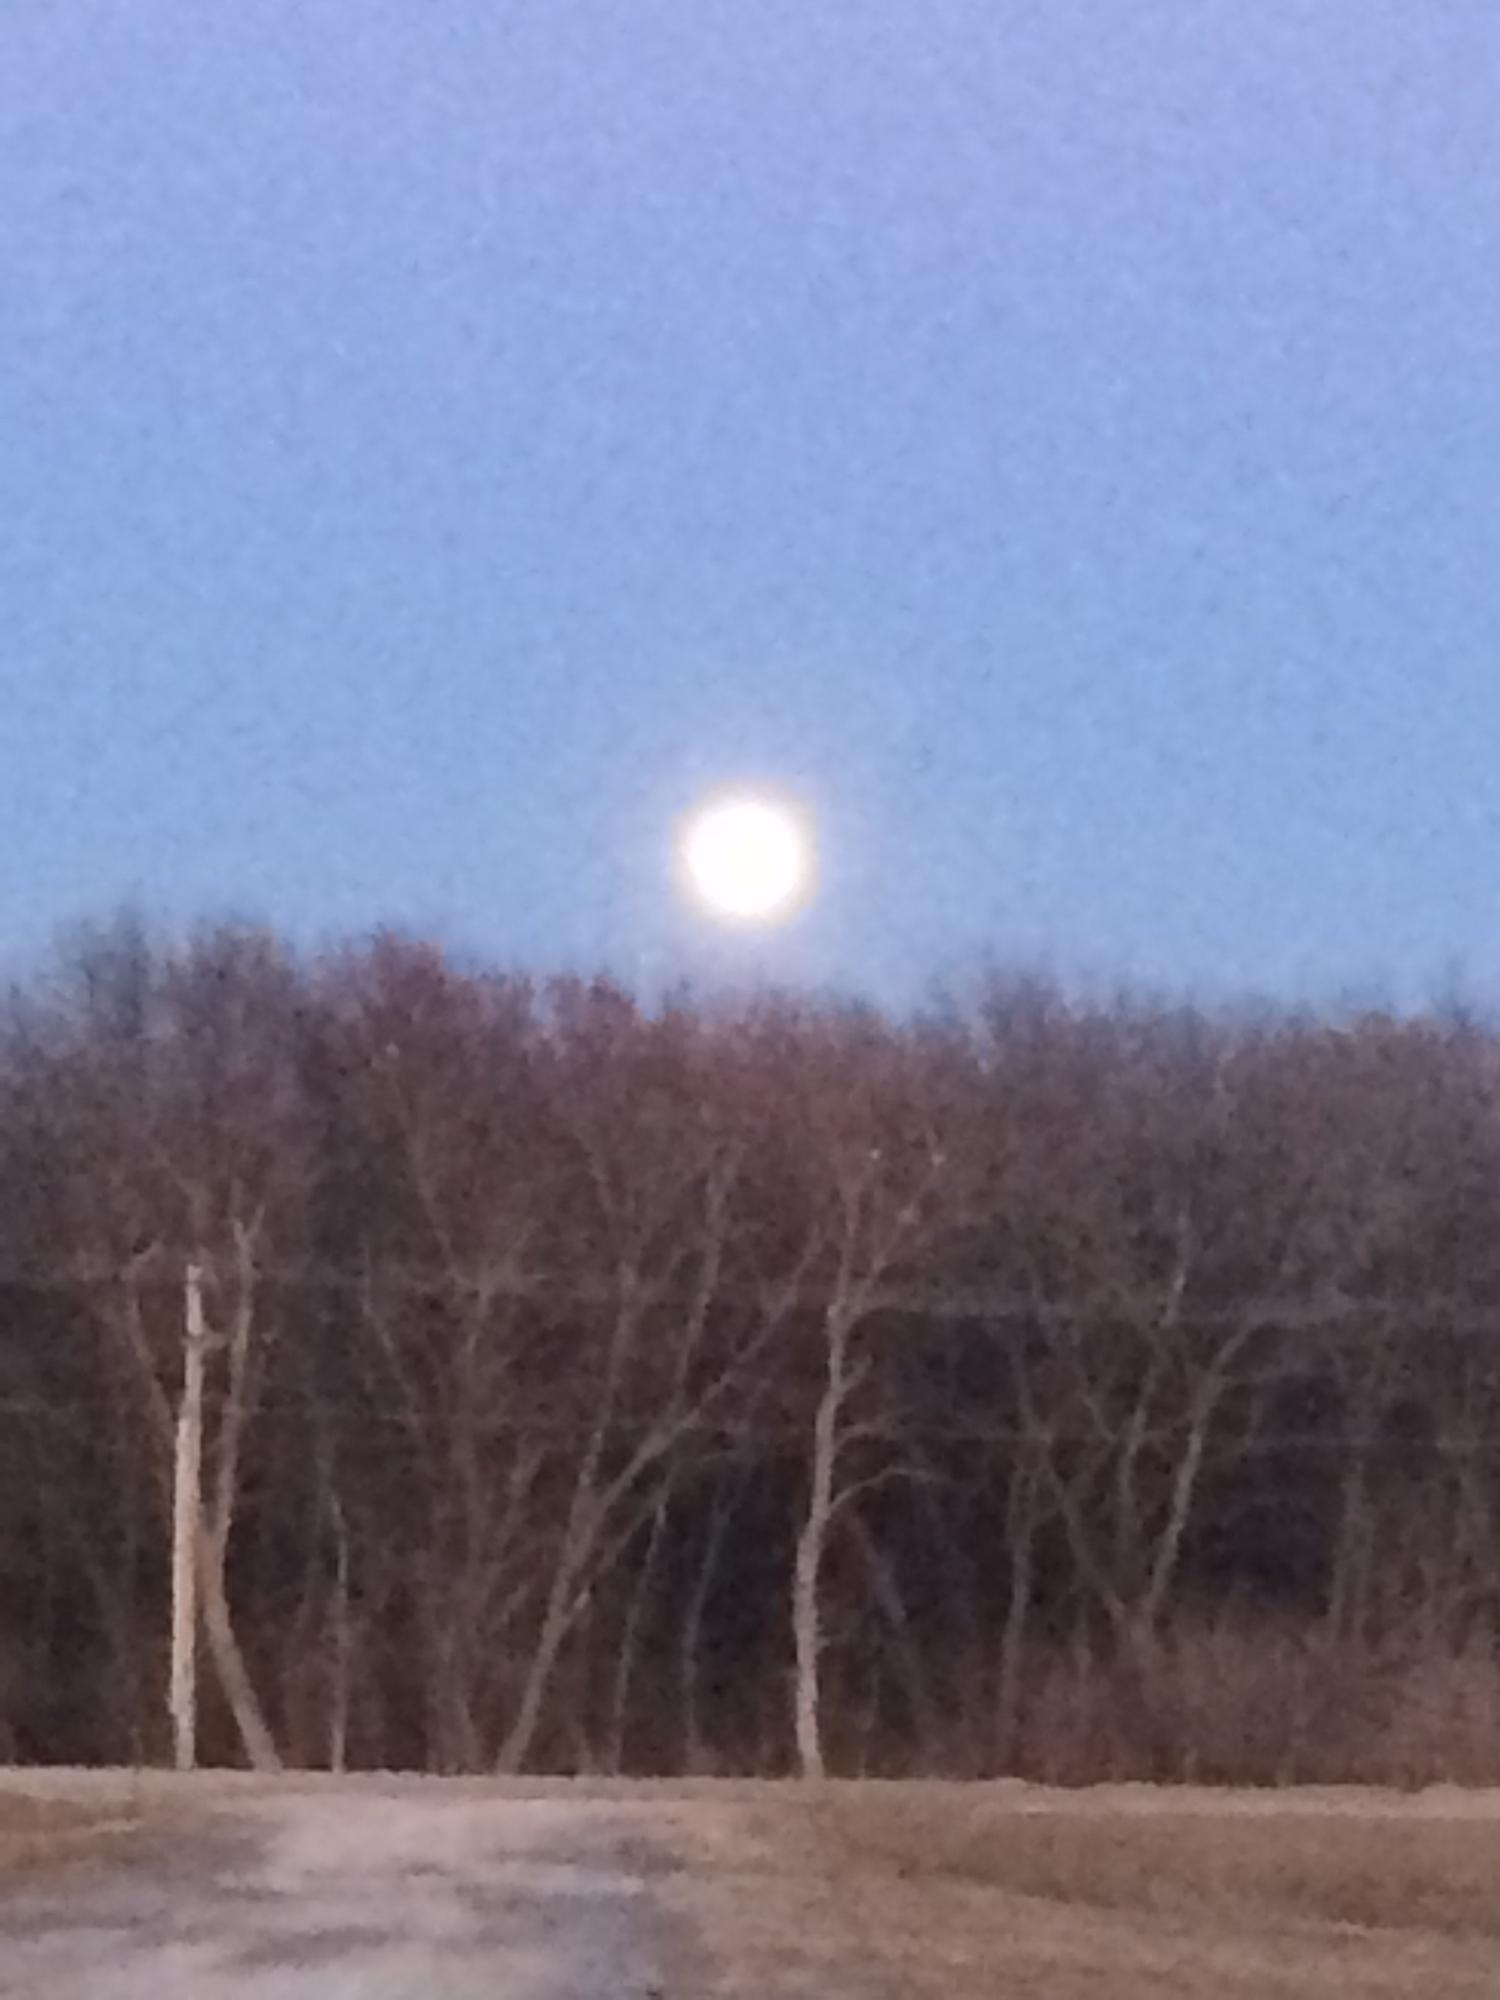 Praise the moon